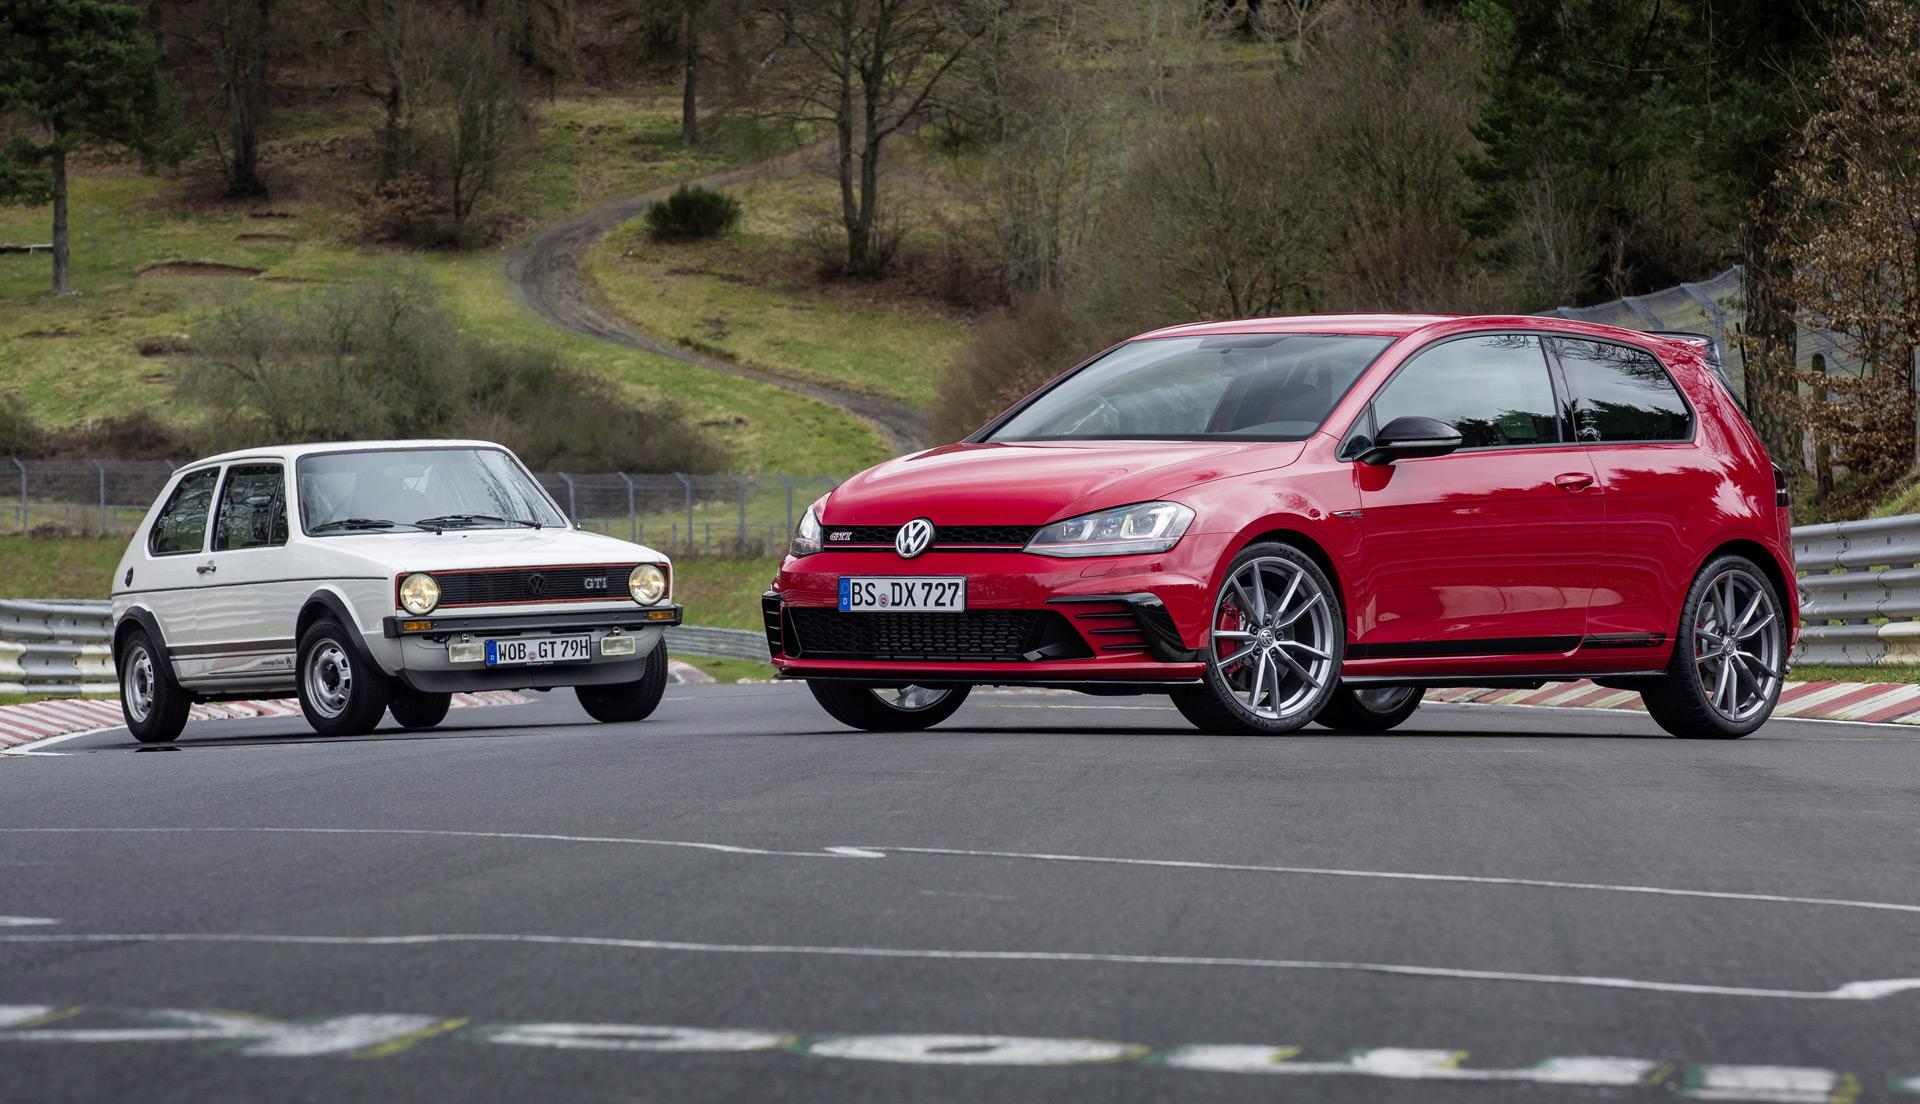 Focus St Vs Gti >> 2016 Volkswagen Gti Vs 2016 Ford Focus St Compare Cars